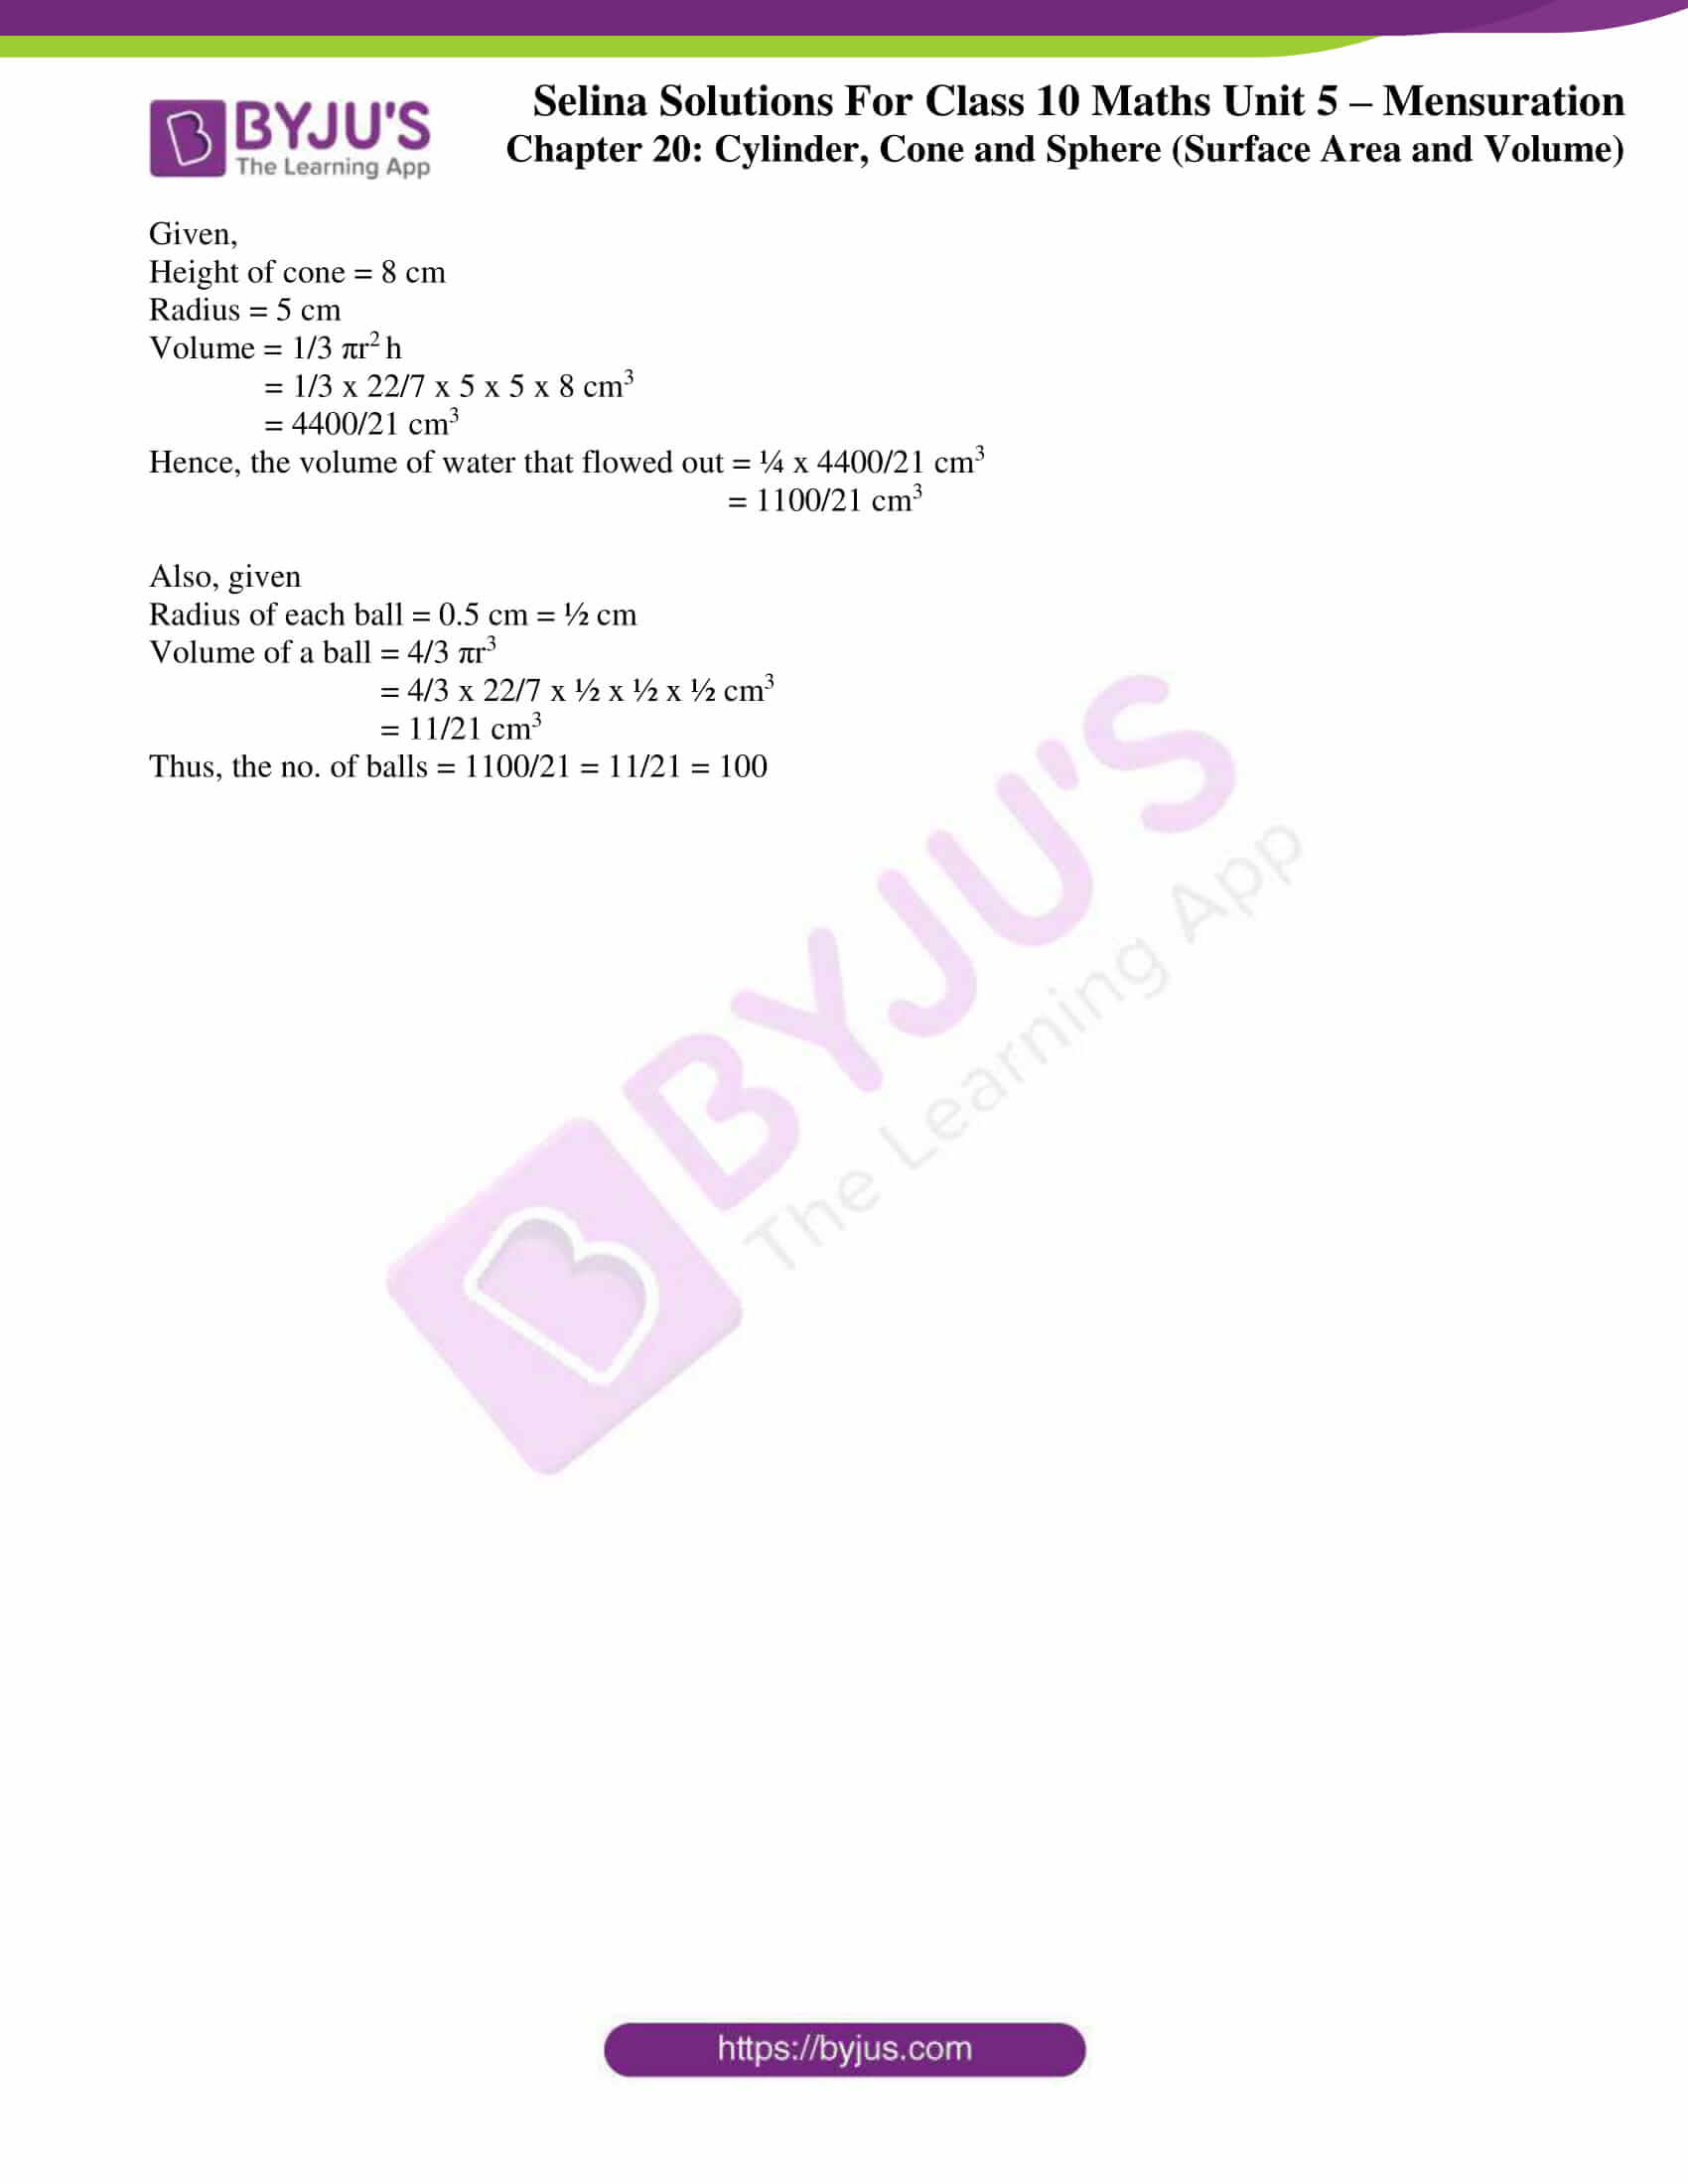 selina-sol-maths-class-10-ch-20-ex-e-4